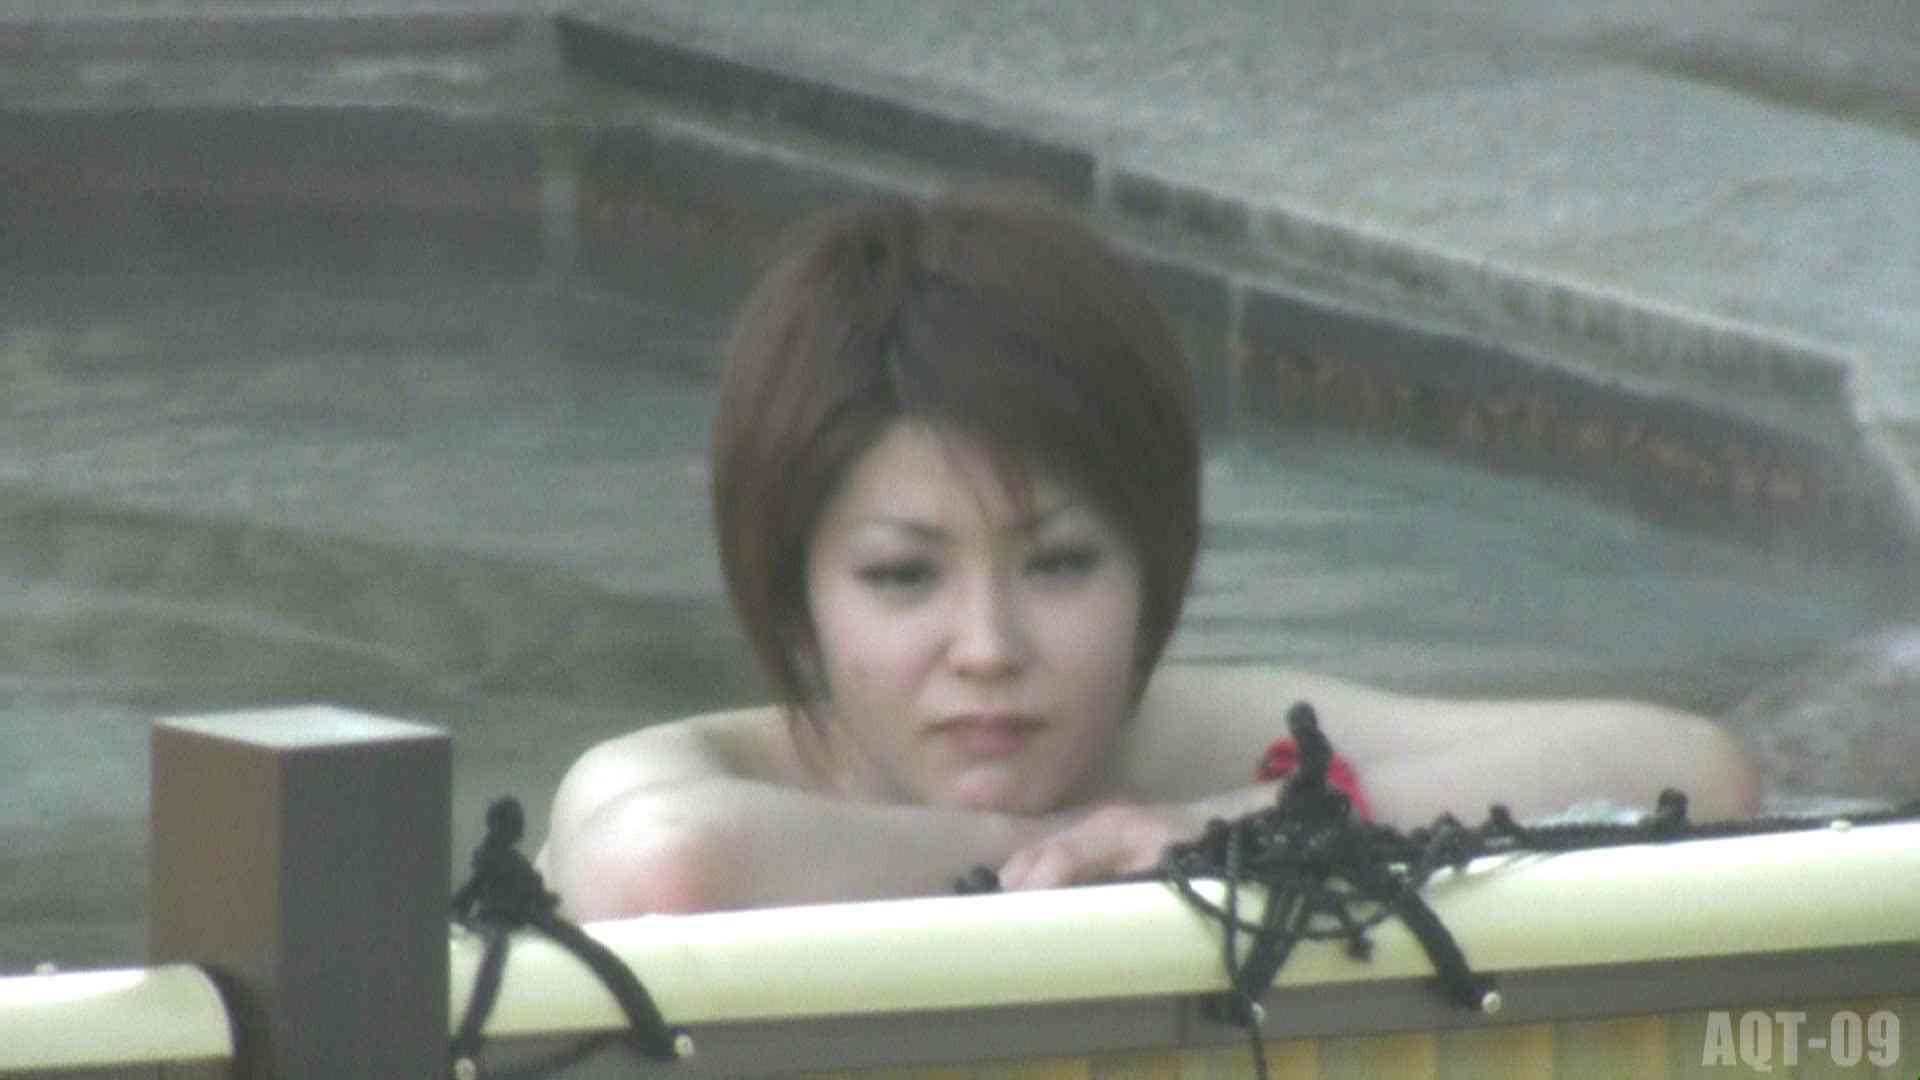 Aquaな露天風呂Vol.779 OLセックス 覗きおまんこ画像 107画像 26